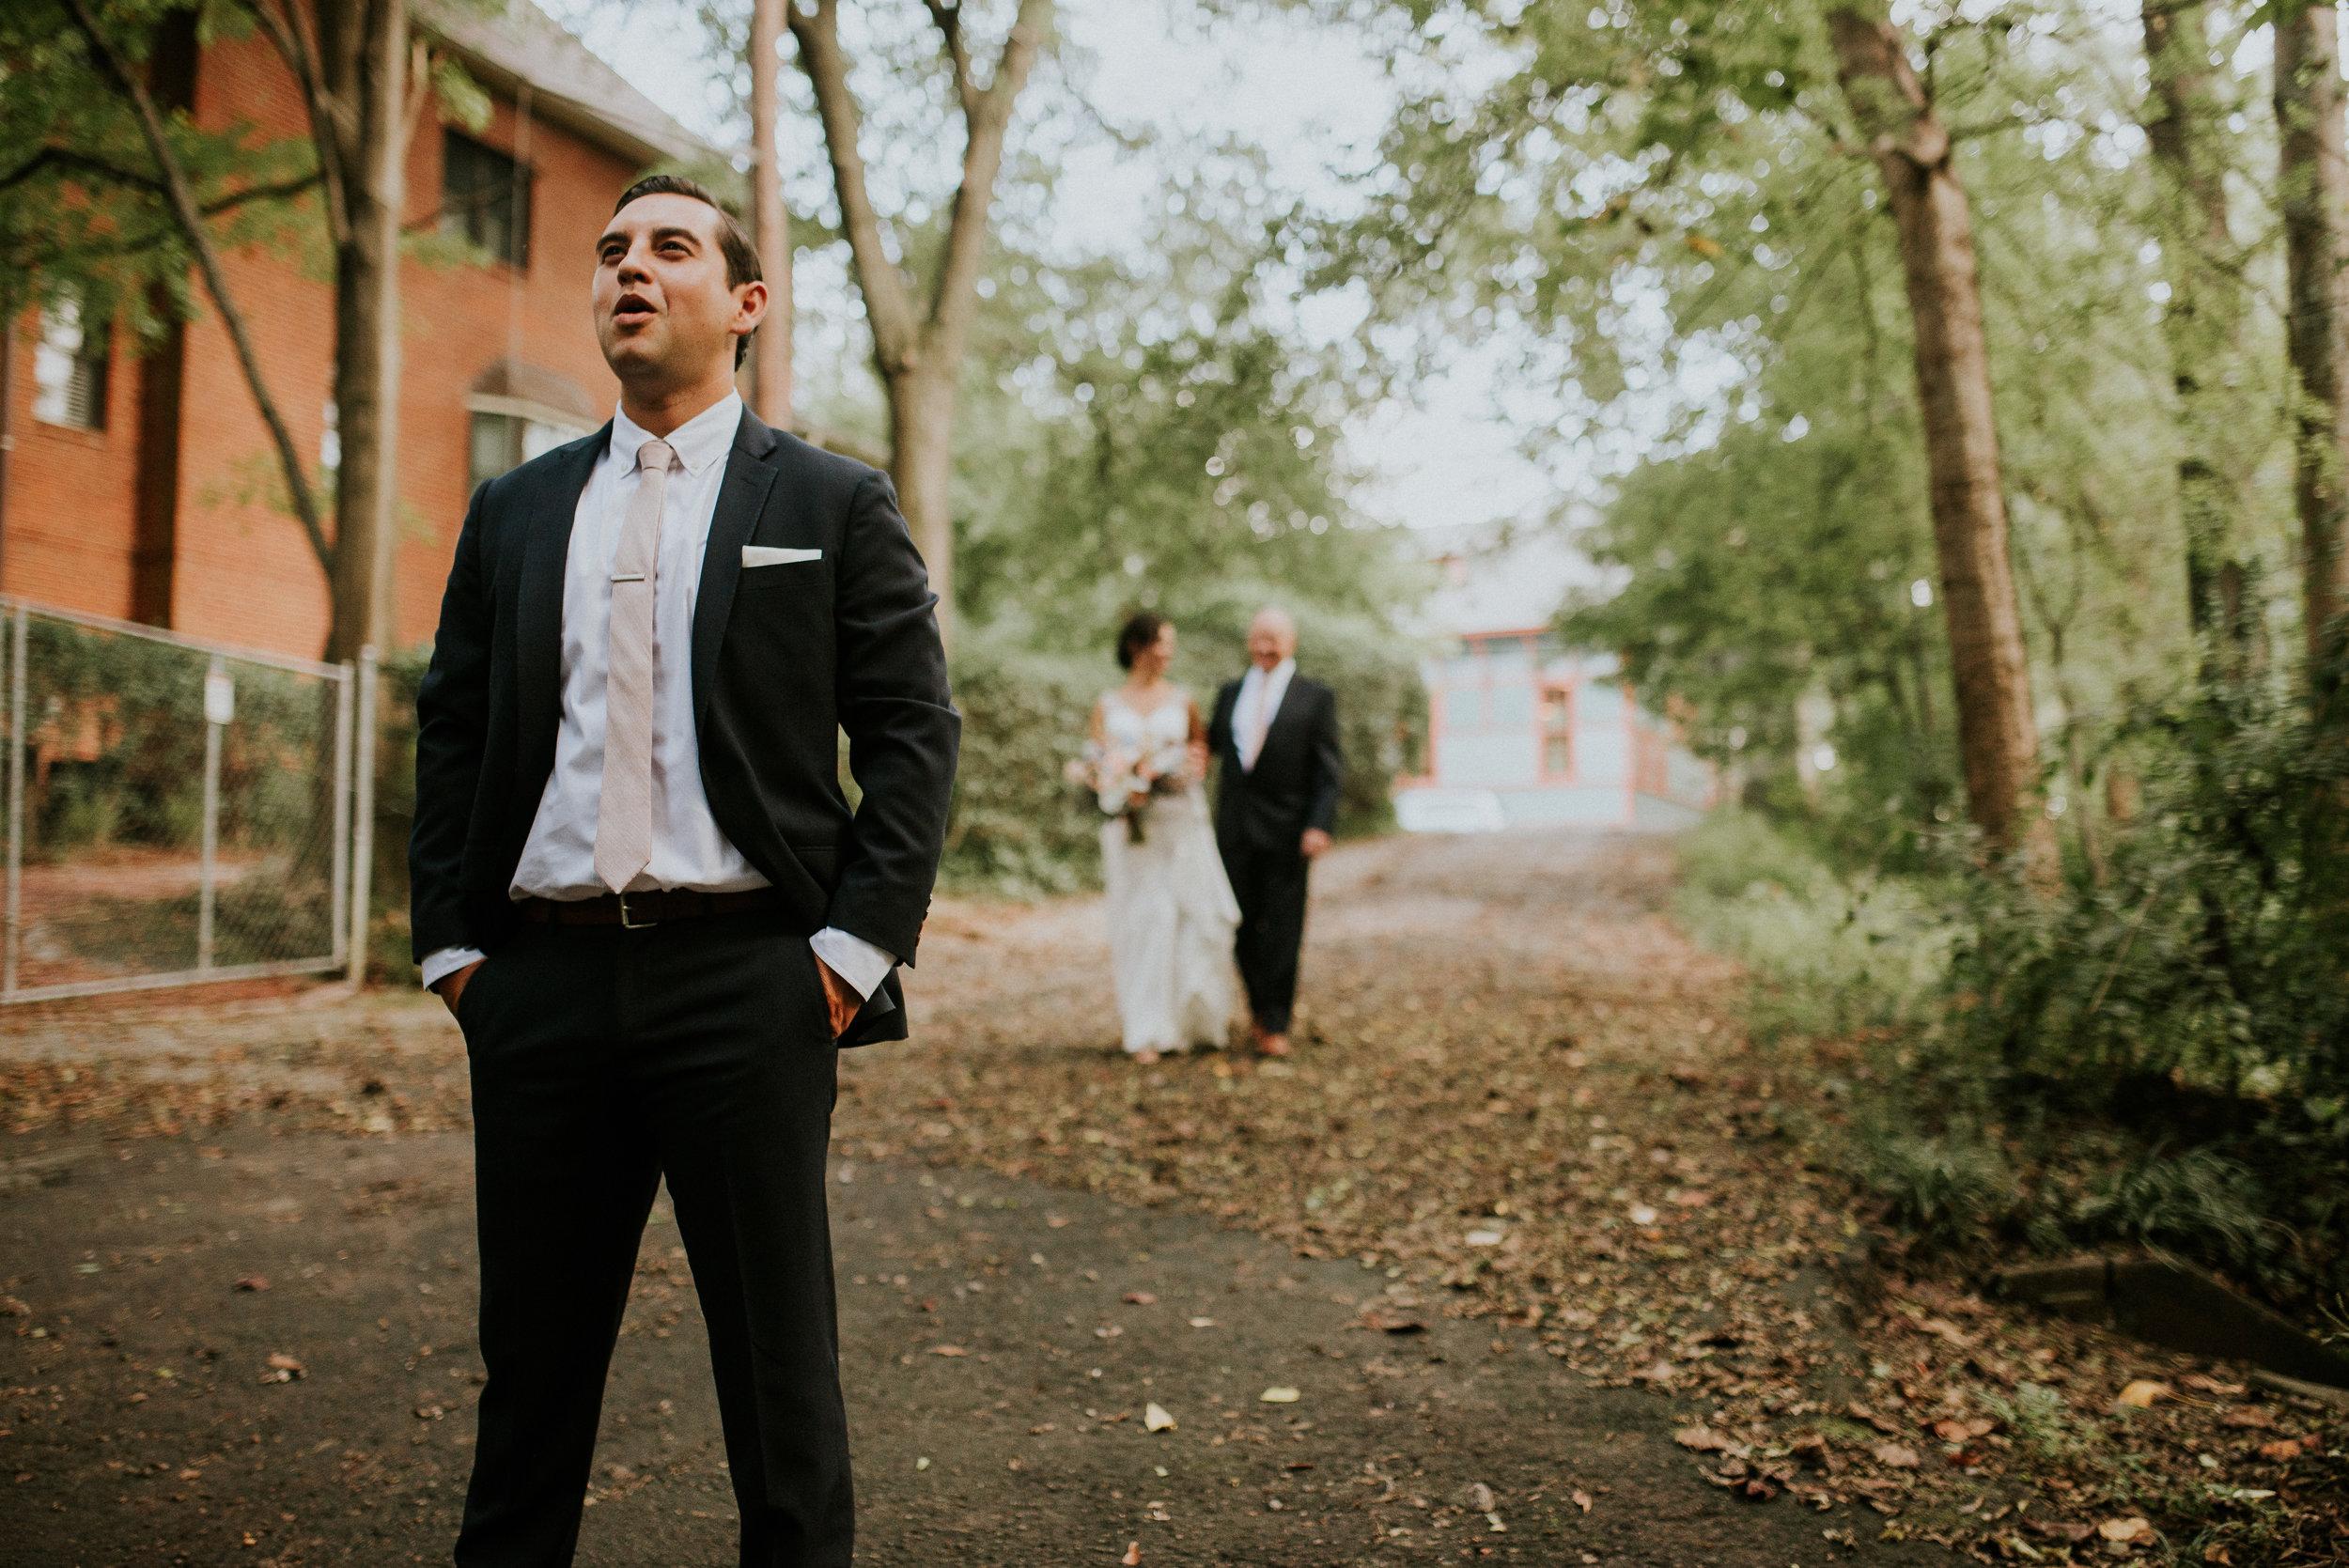 Bride and groom first look at The Trolley Barn in Atlanta, GA